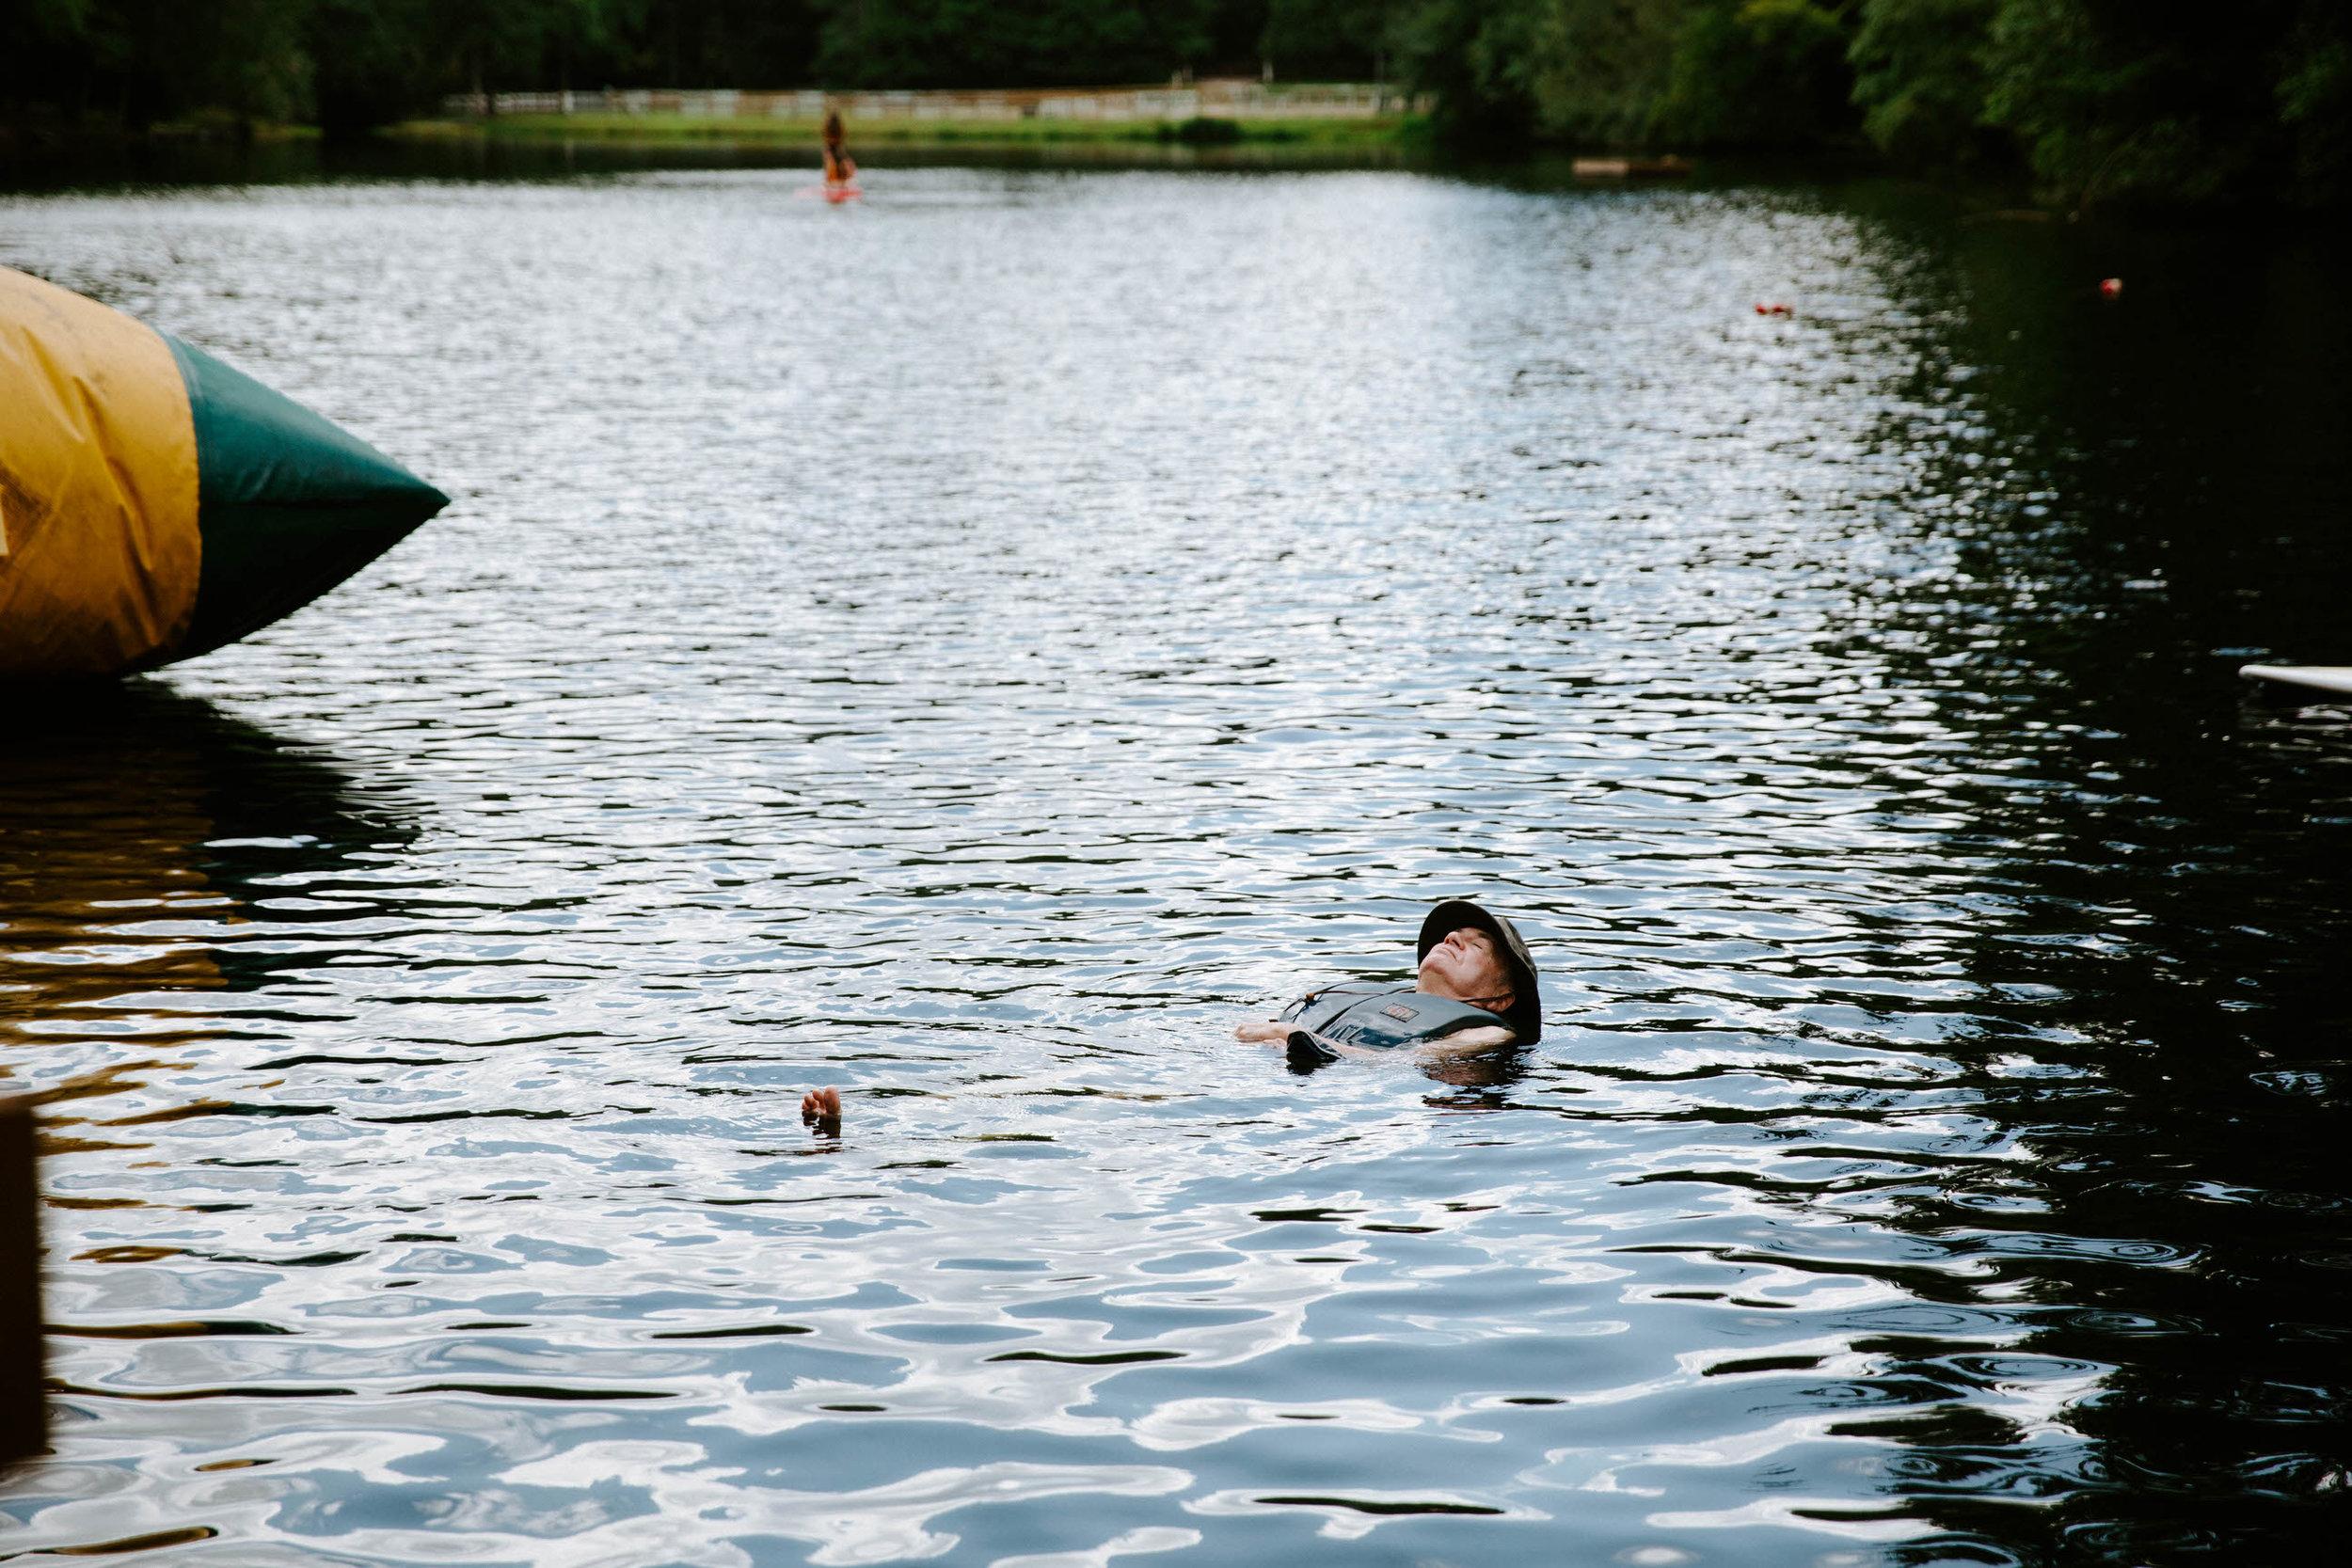 jeremy+elle-Lake-0507.jpg